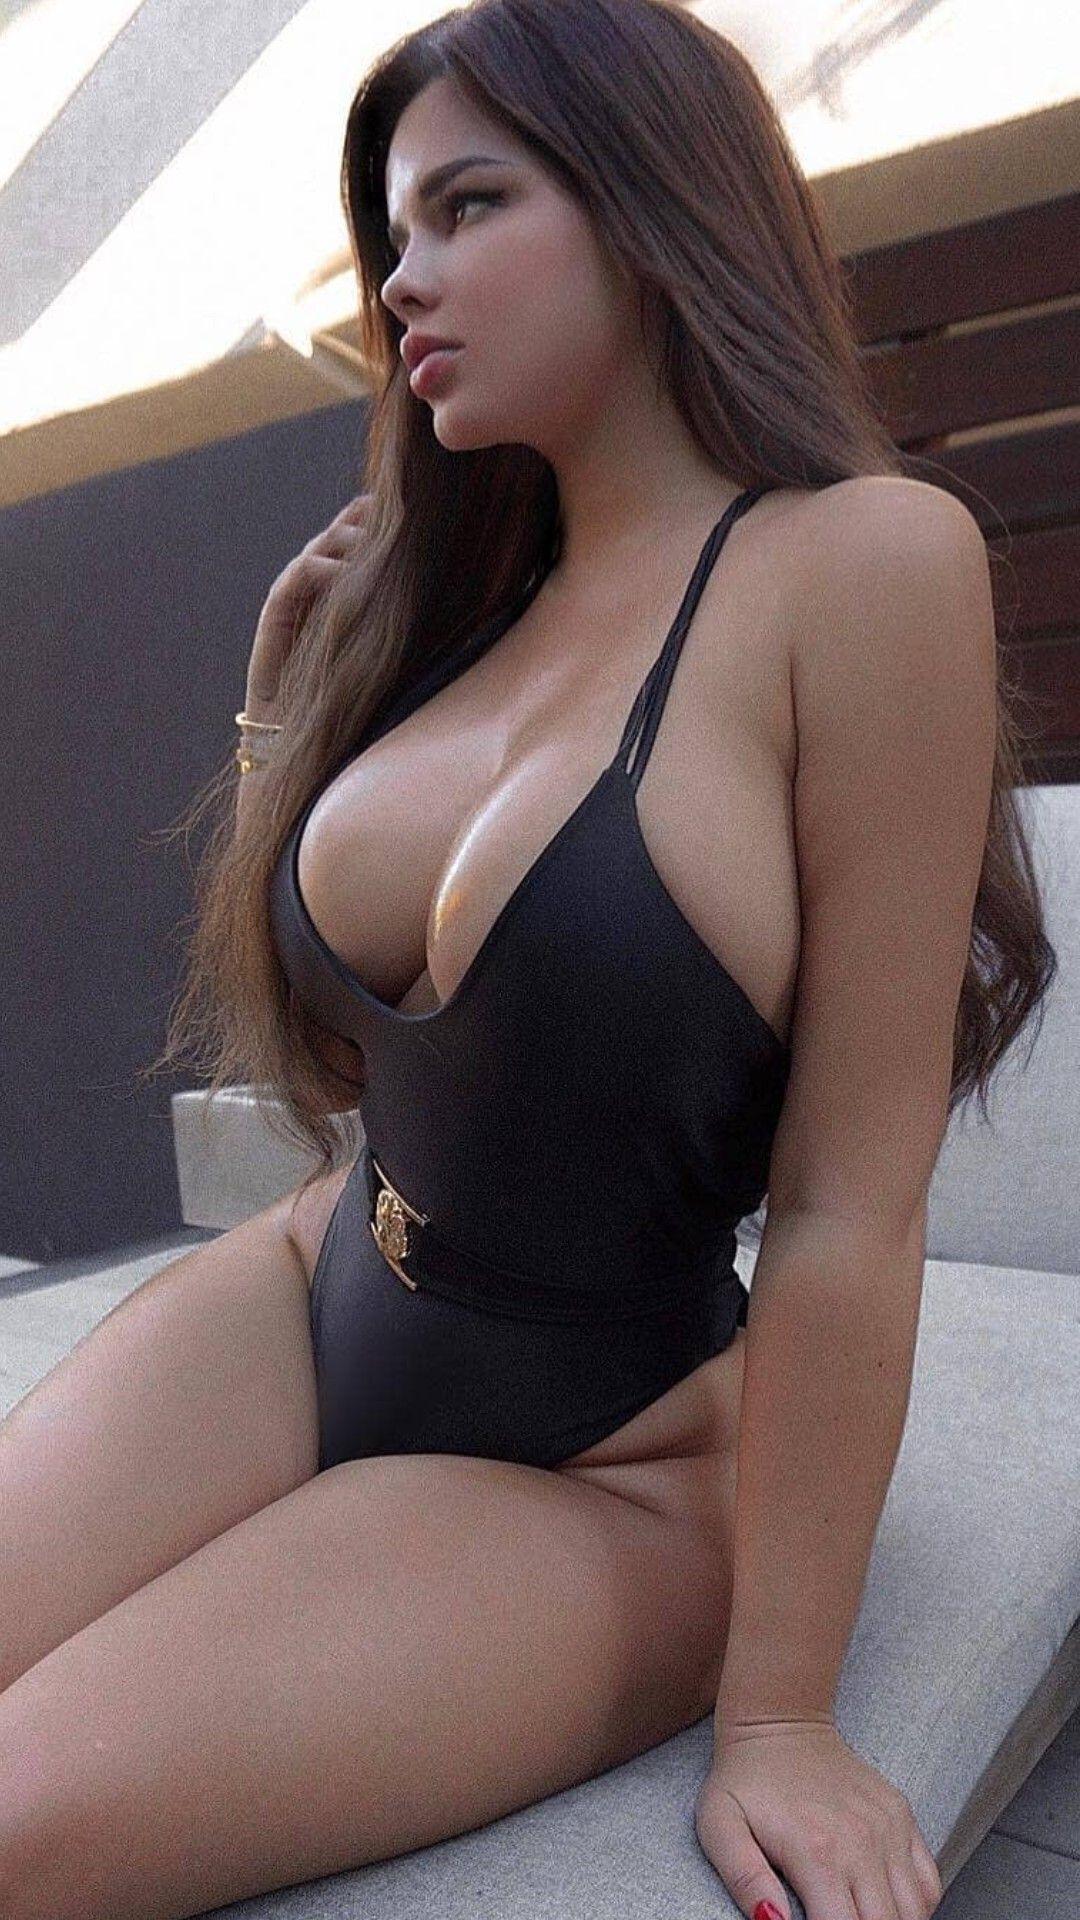 Bikini Jordy Murray nude (23 foto and video), Pussy, Cleavage, Boobs, bra 2015